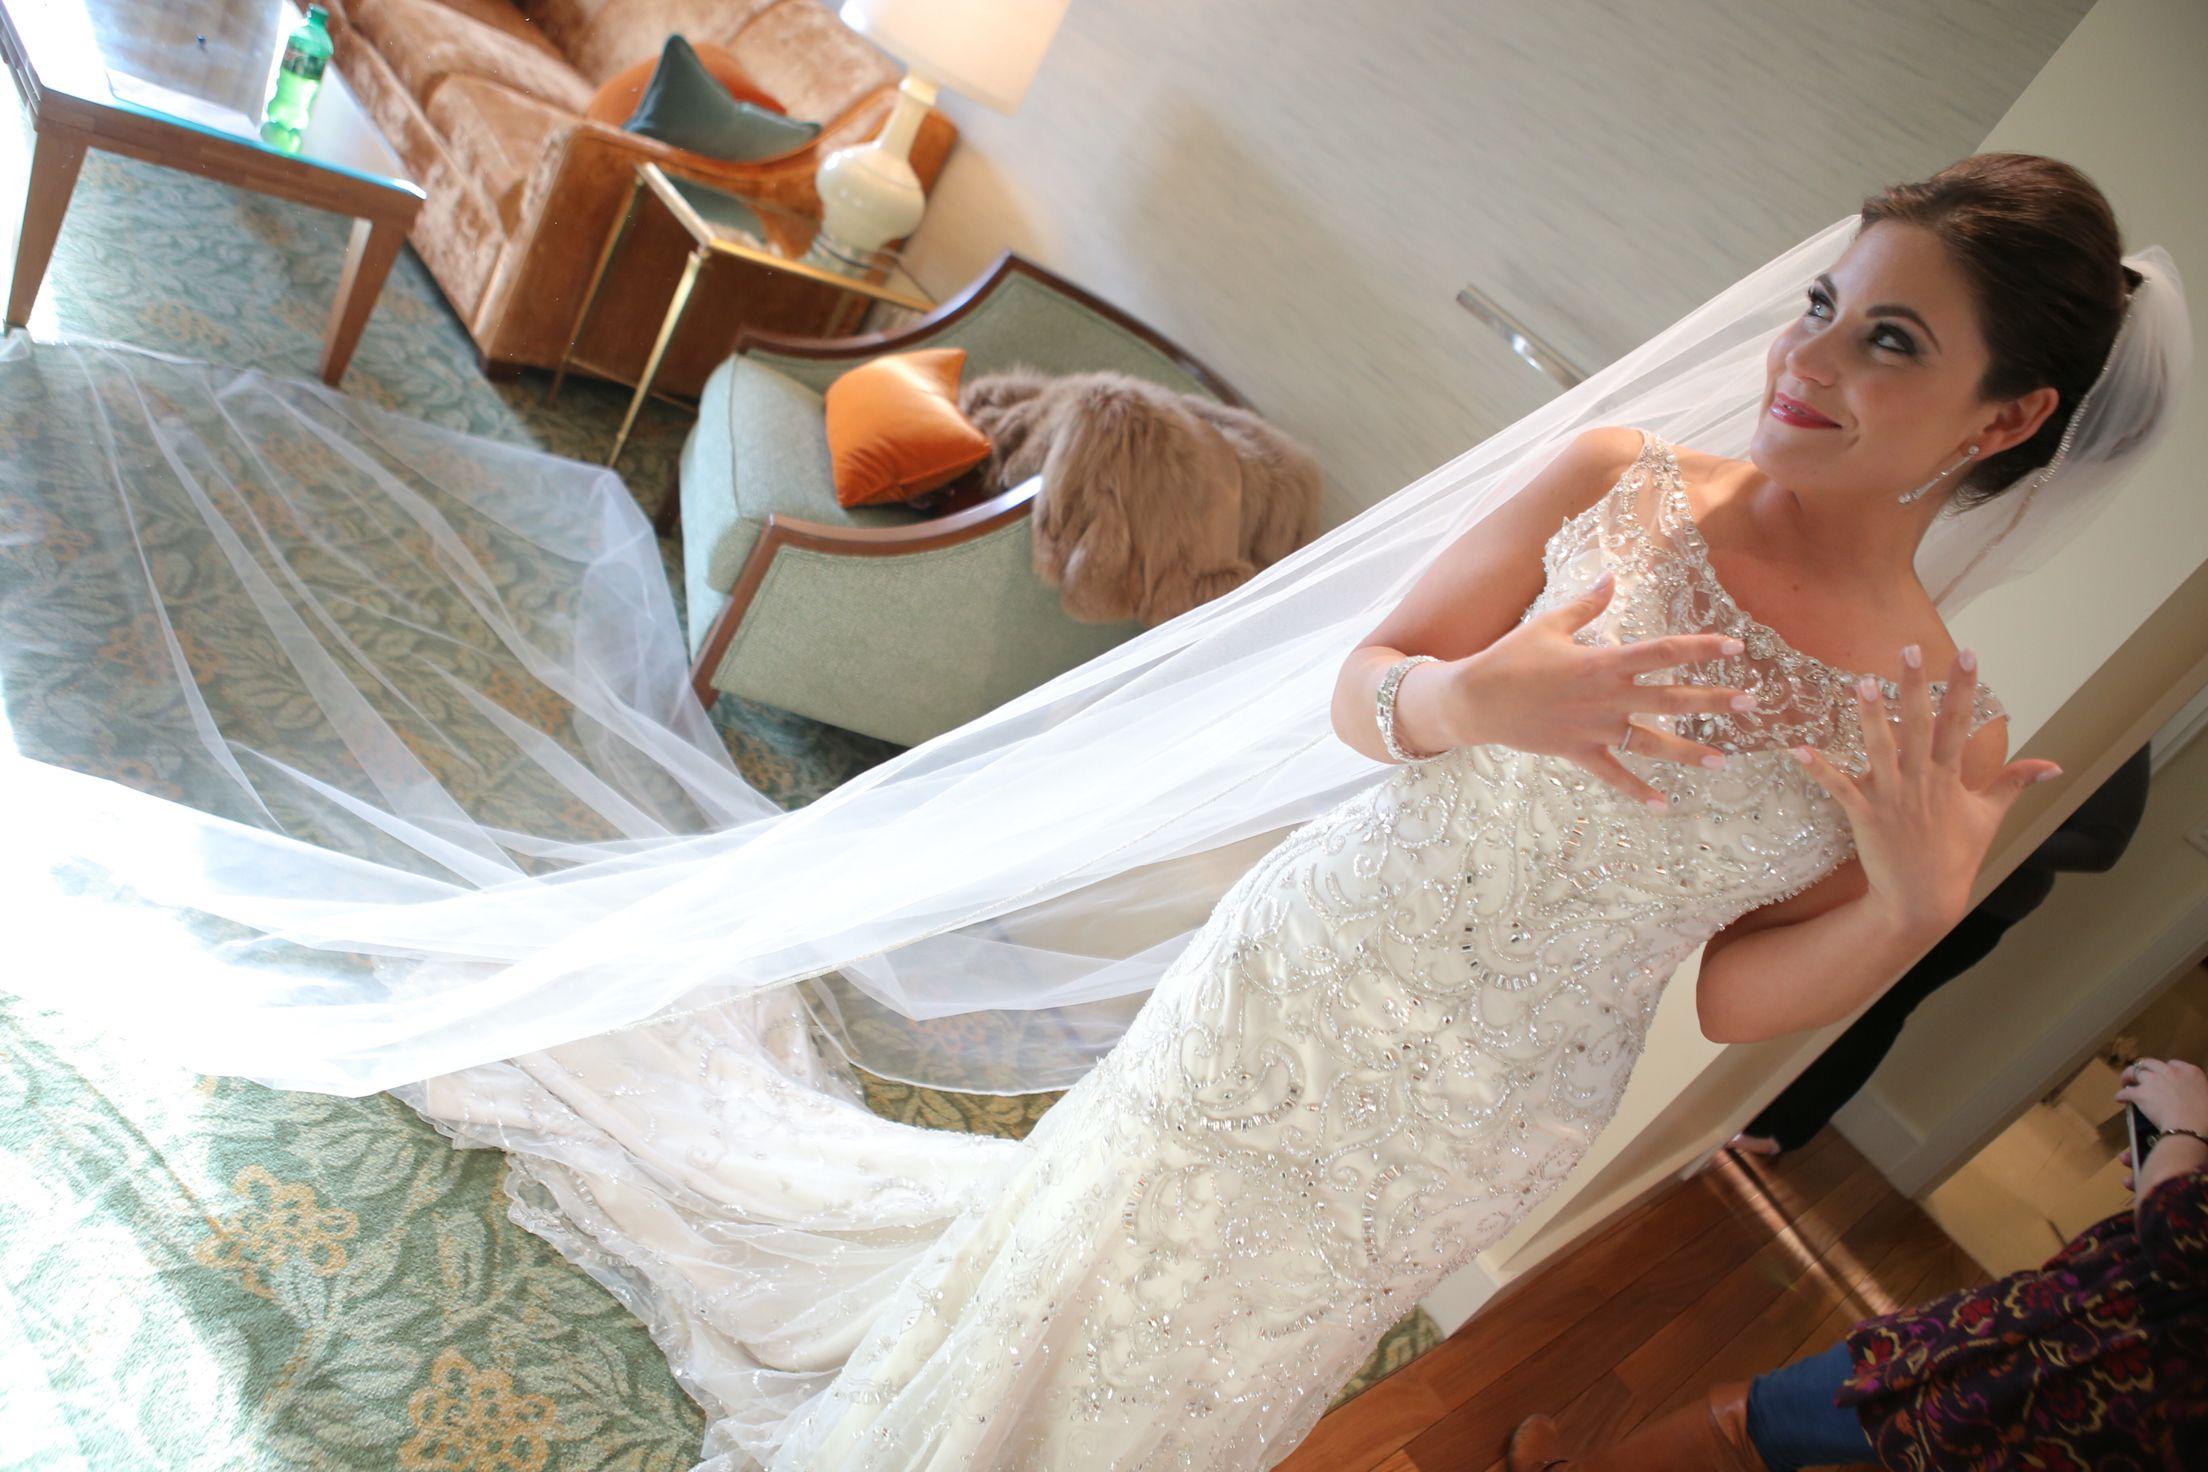 Pin by Tina Pedranti Miljevic on My Winter Boston Wedding 12.13.14 ...